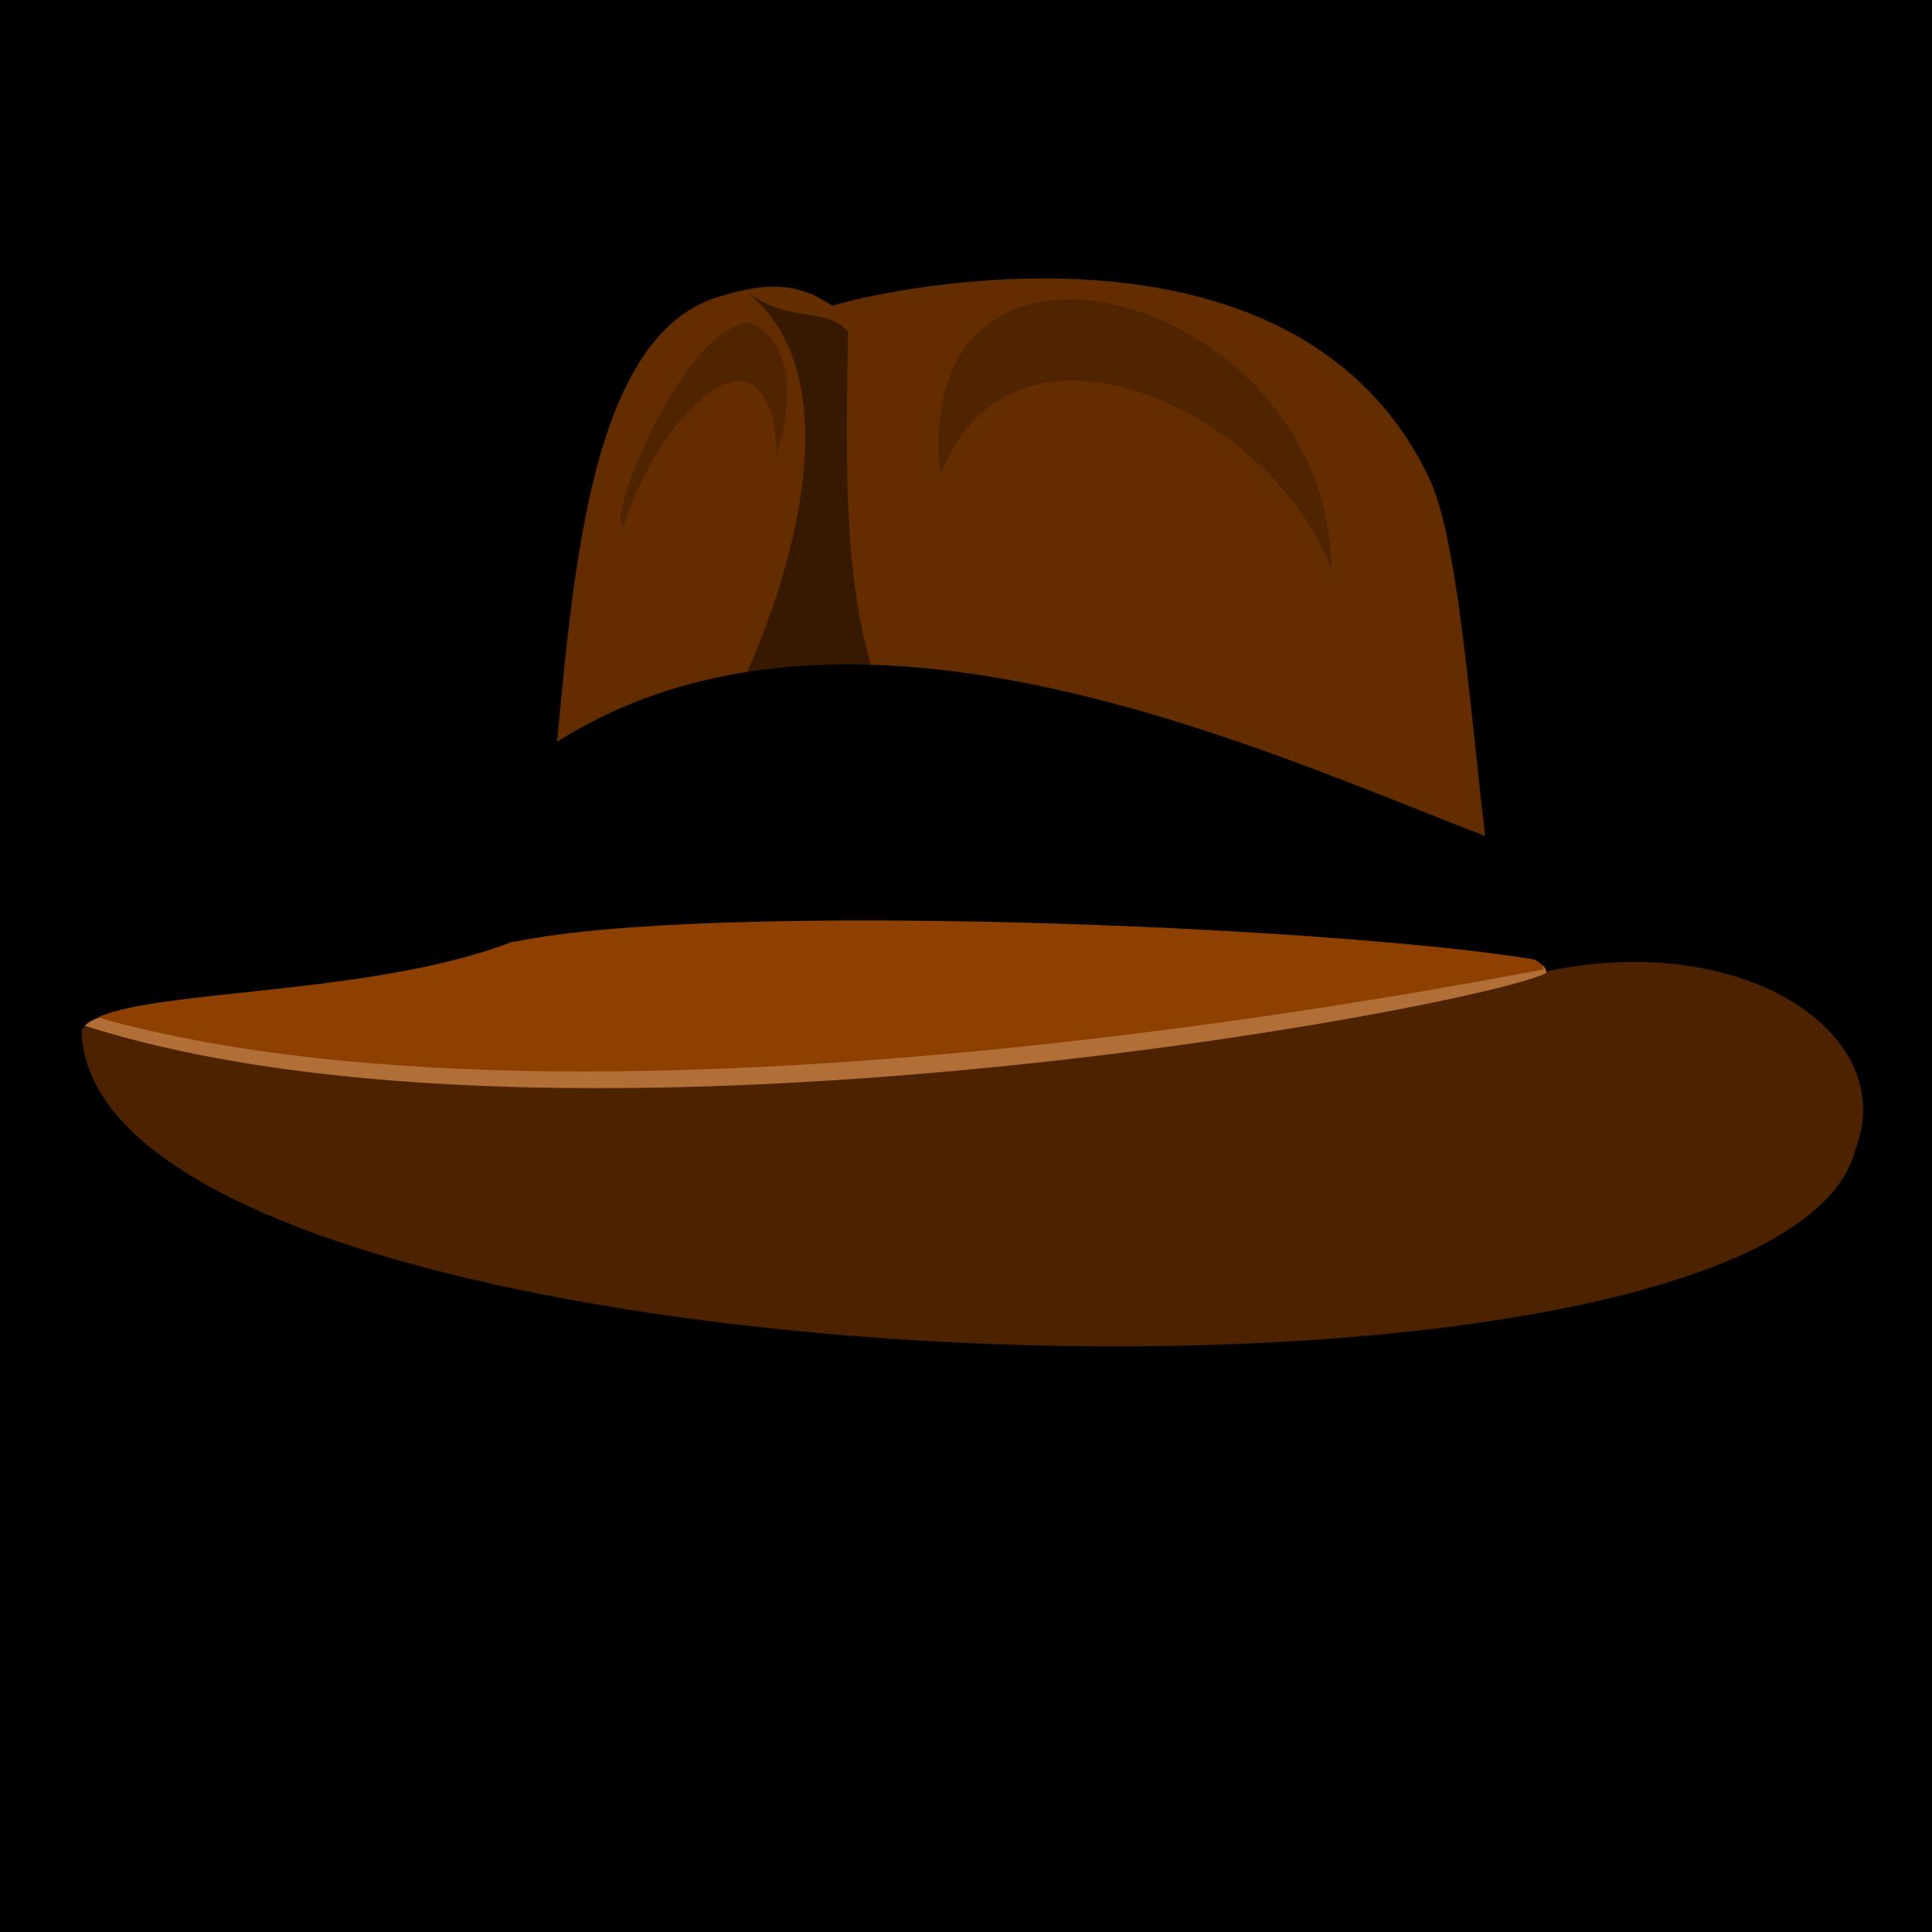 Hat clipart professor. Adventurer big image png